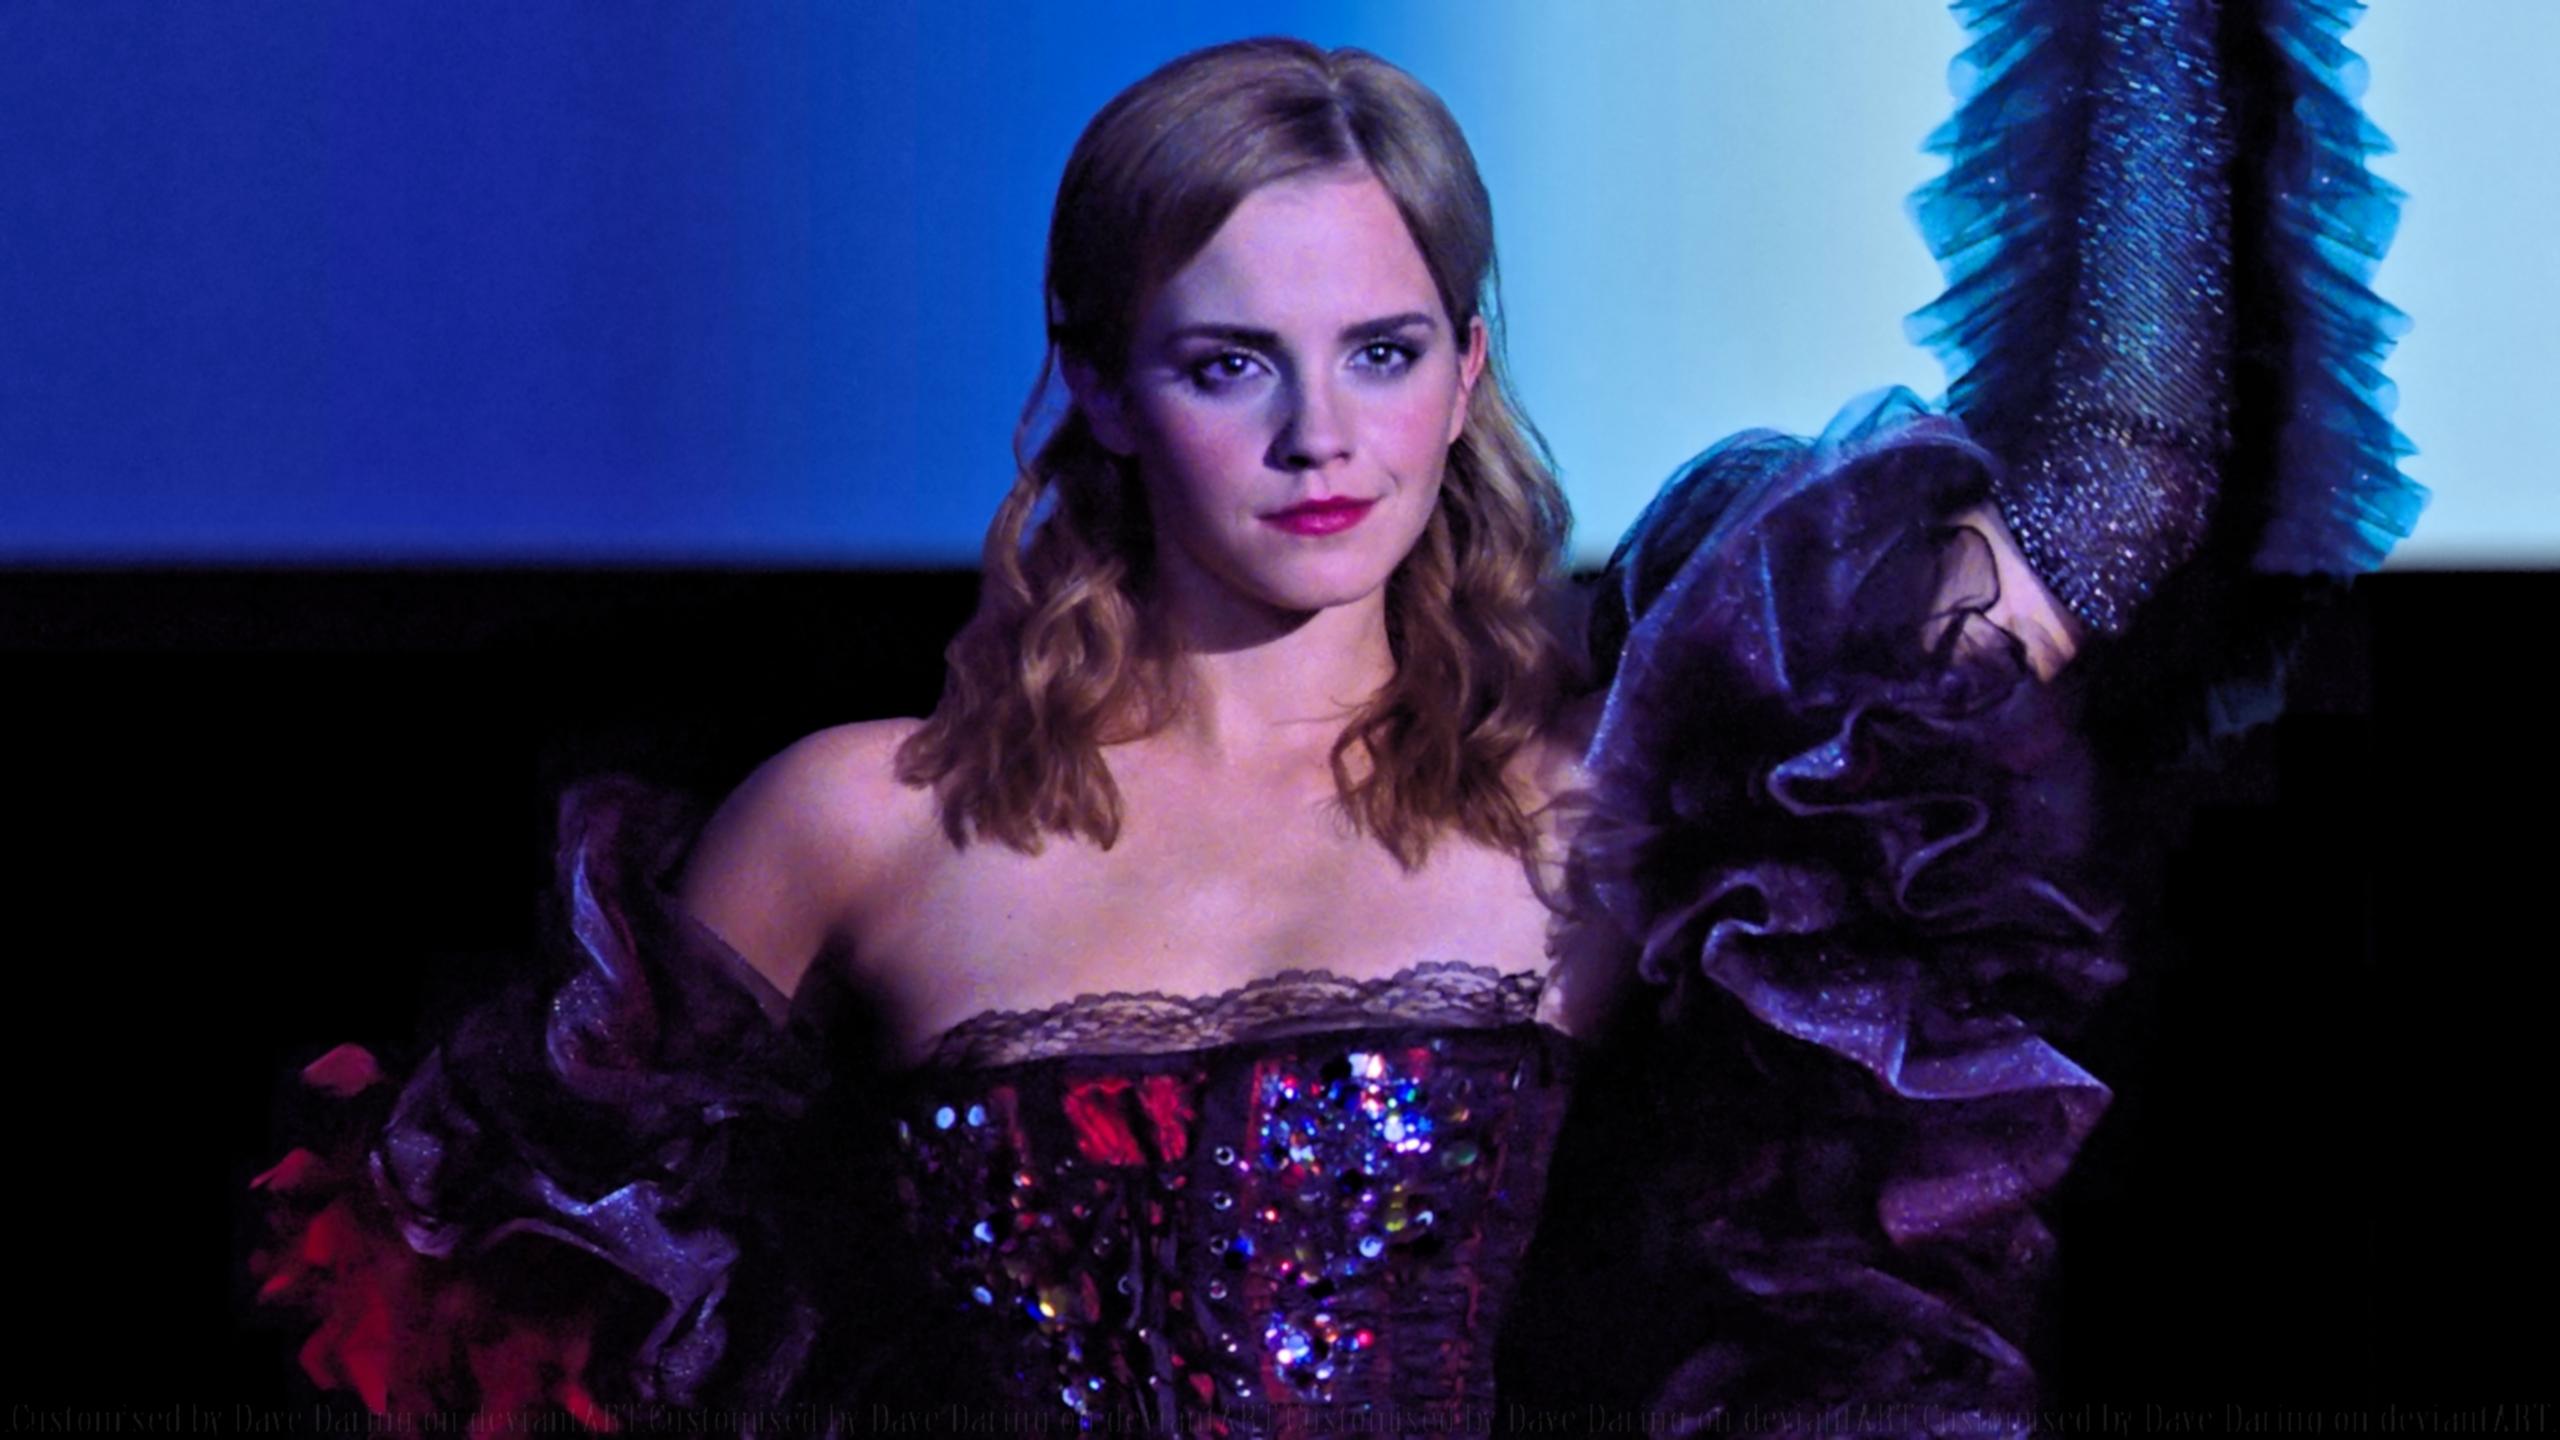 Emma Watson Wallflower II by Dave-Daring